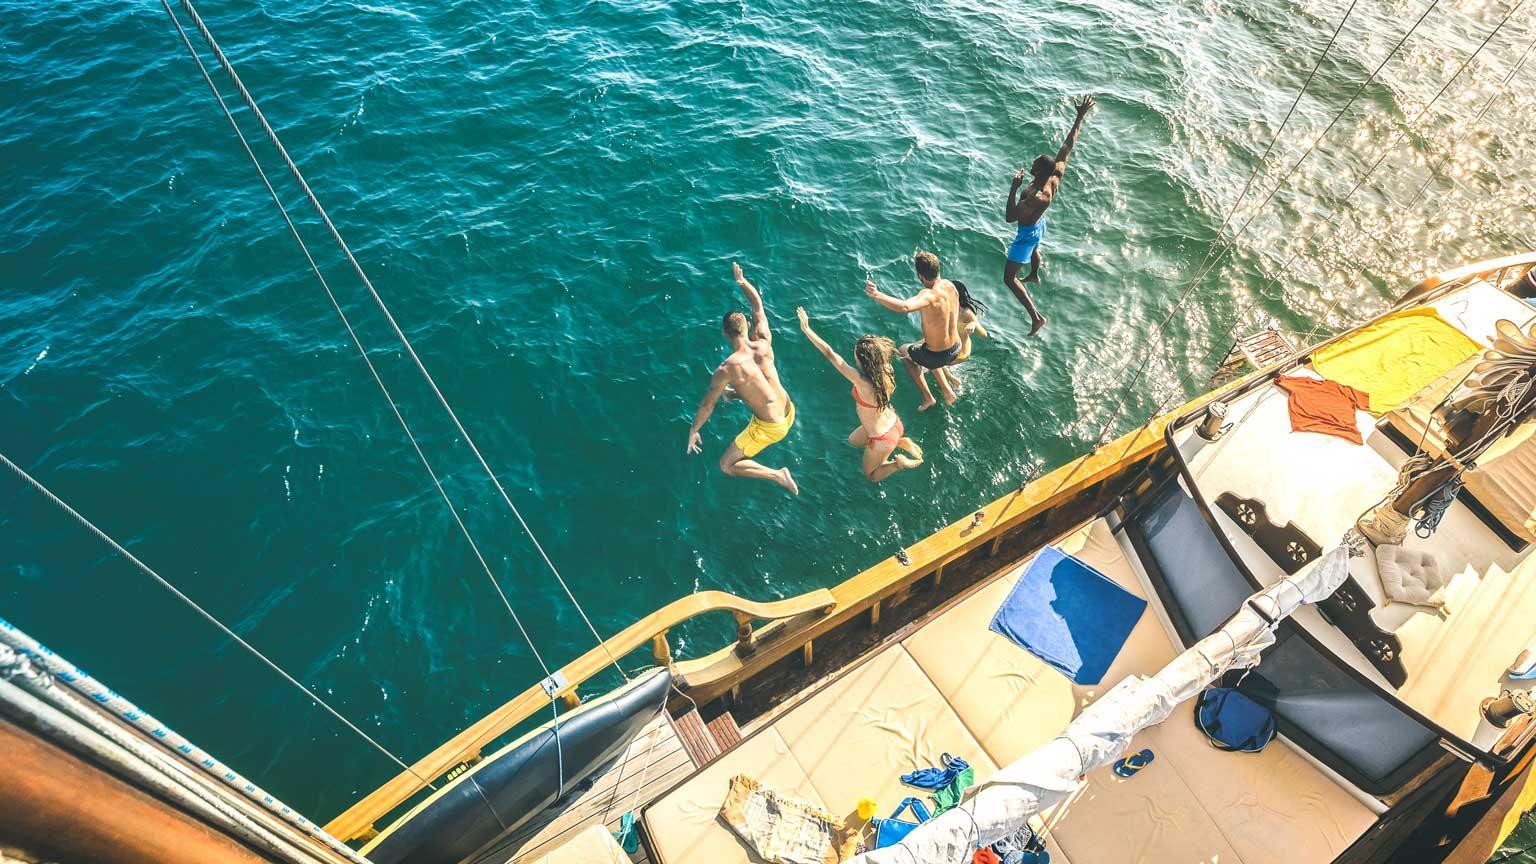 Jumping Into Sea From Sailboat